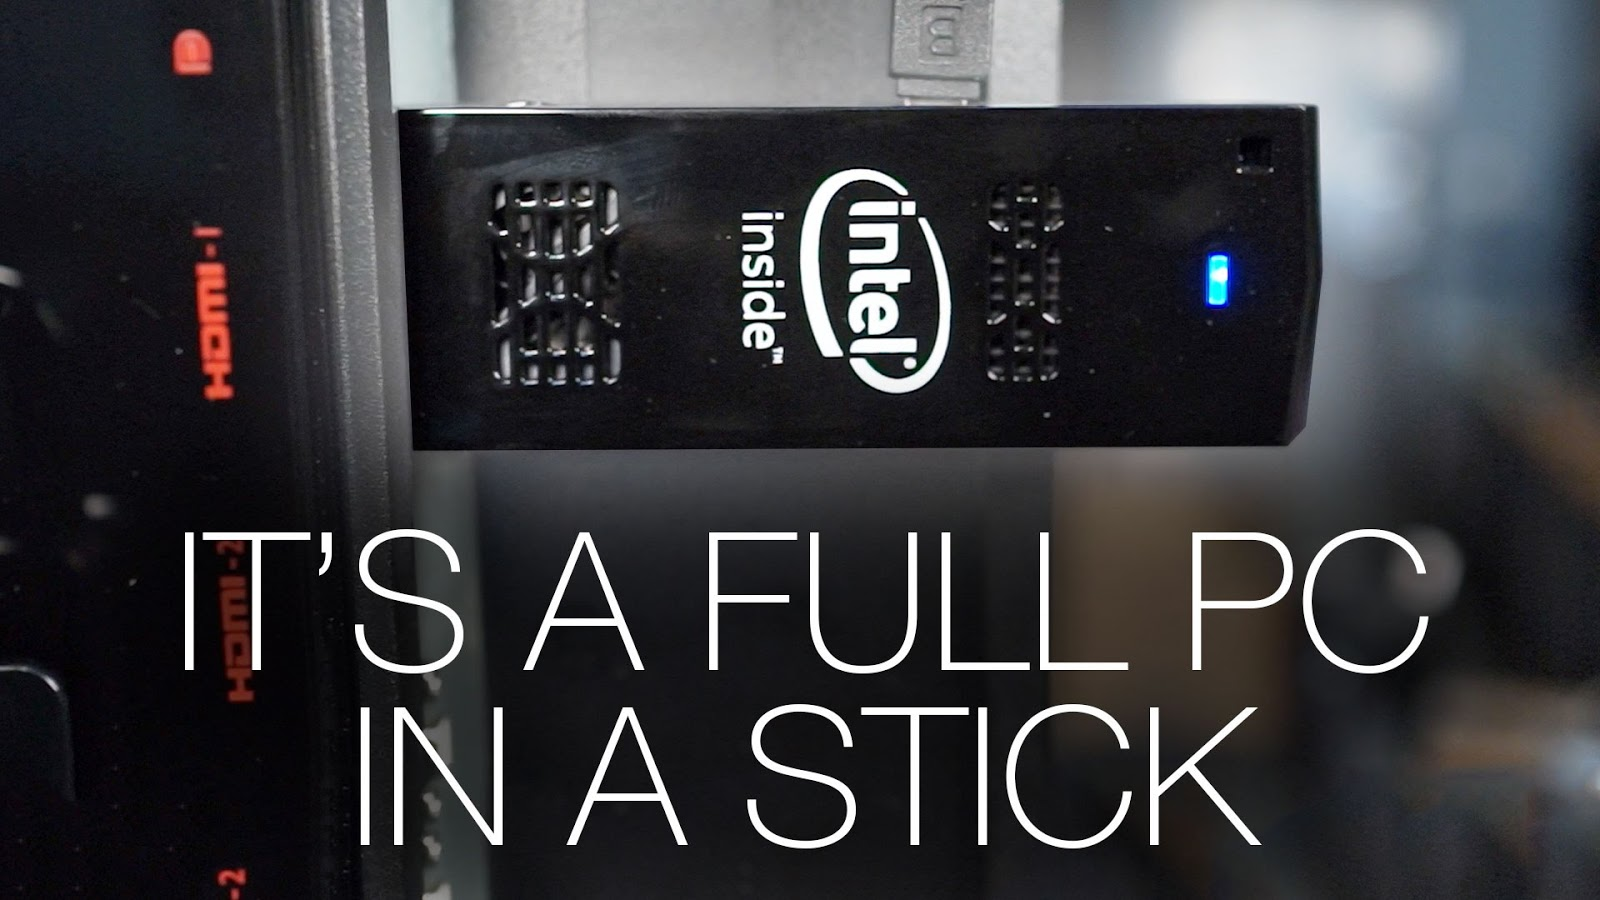 Intel compute stick - TV to computer device